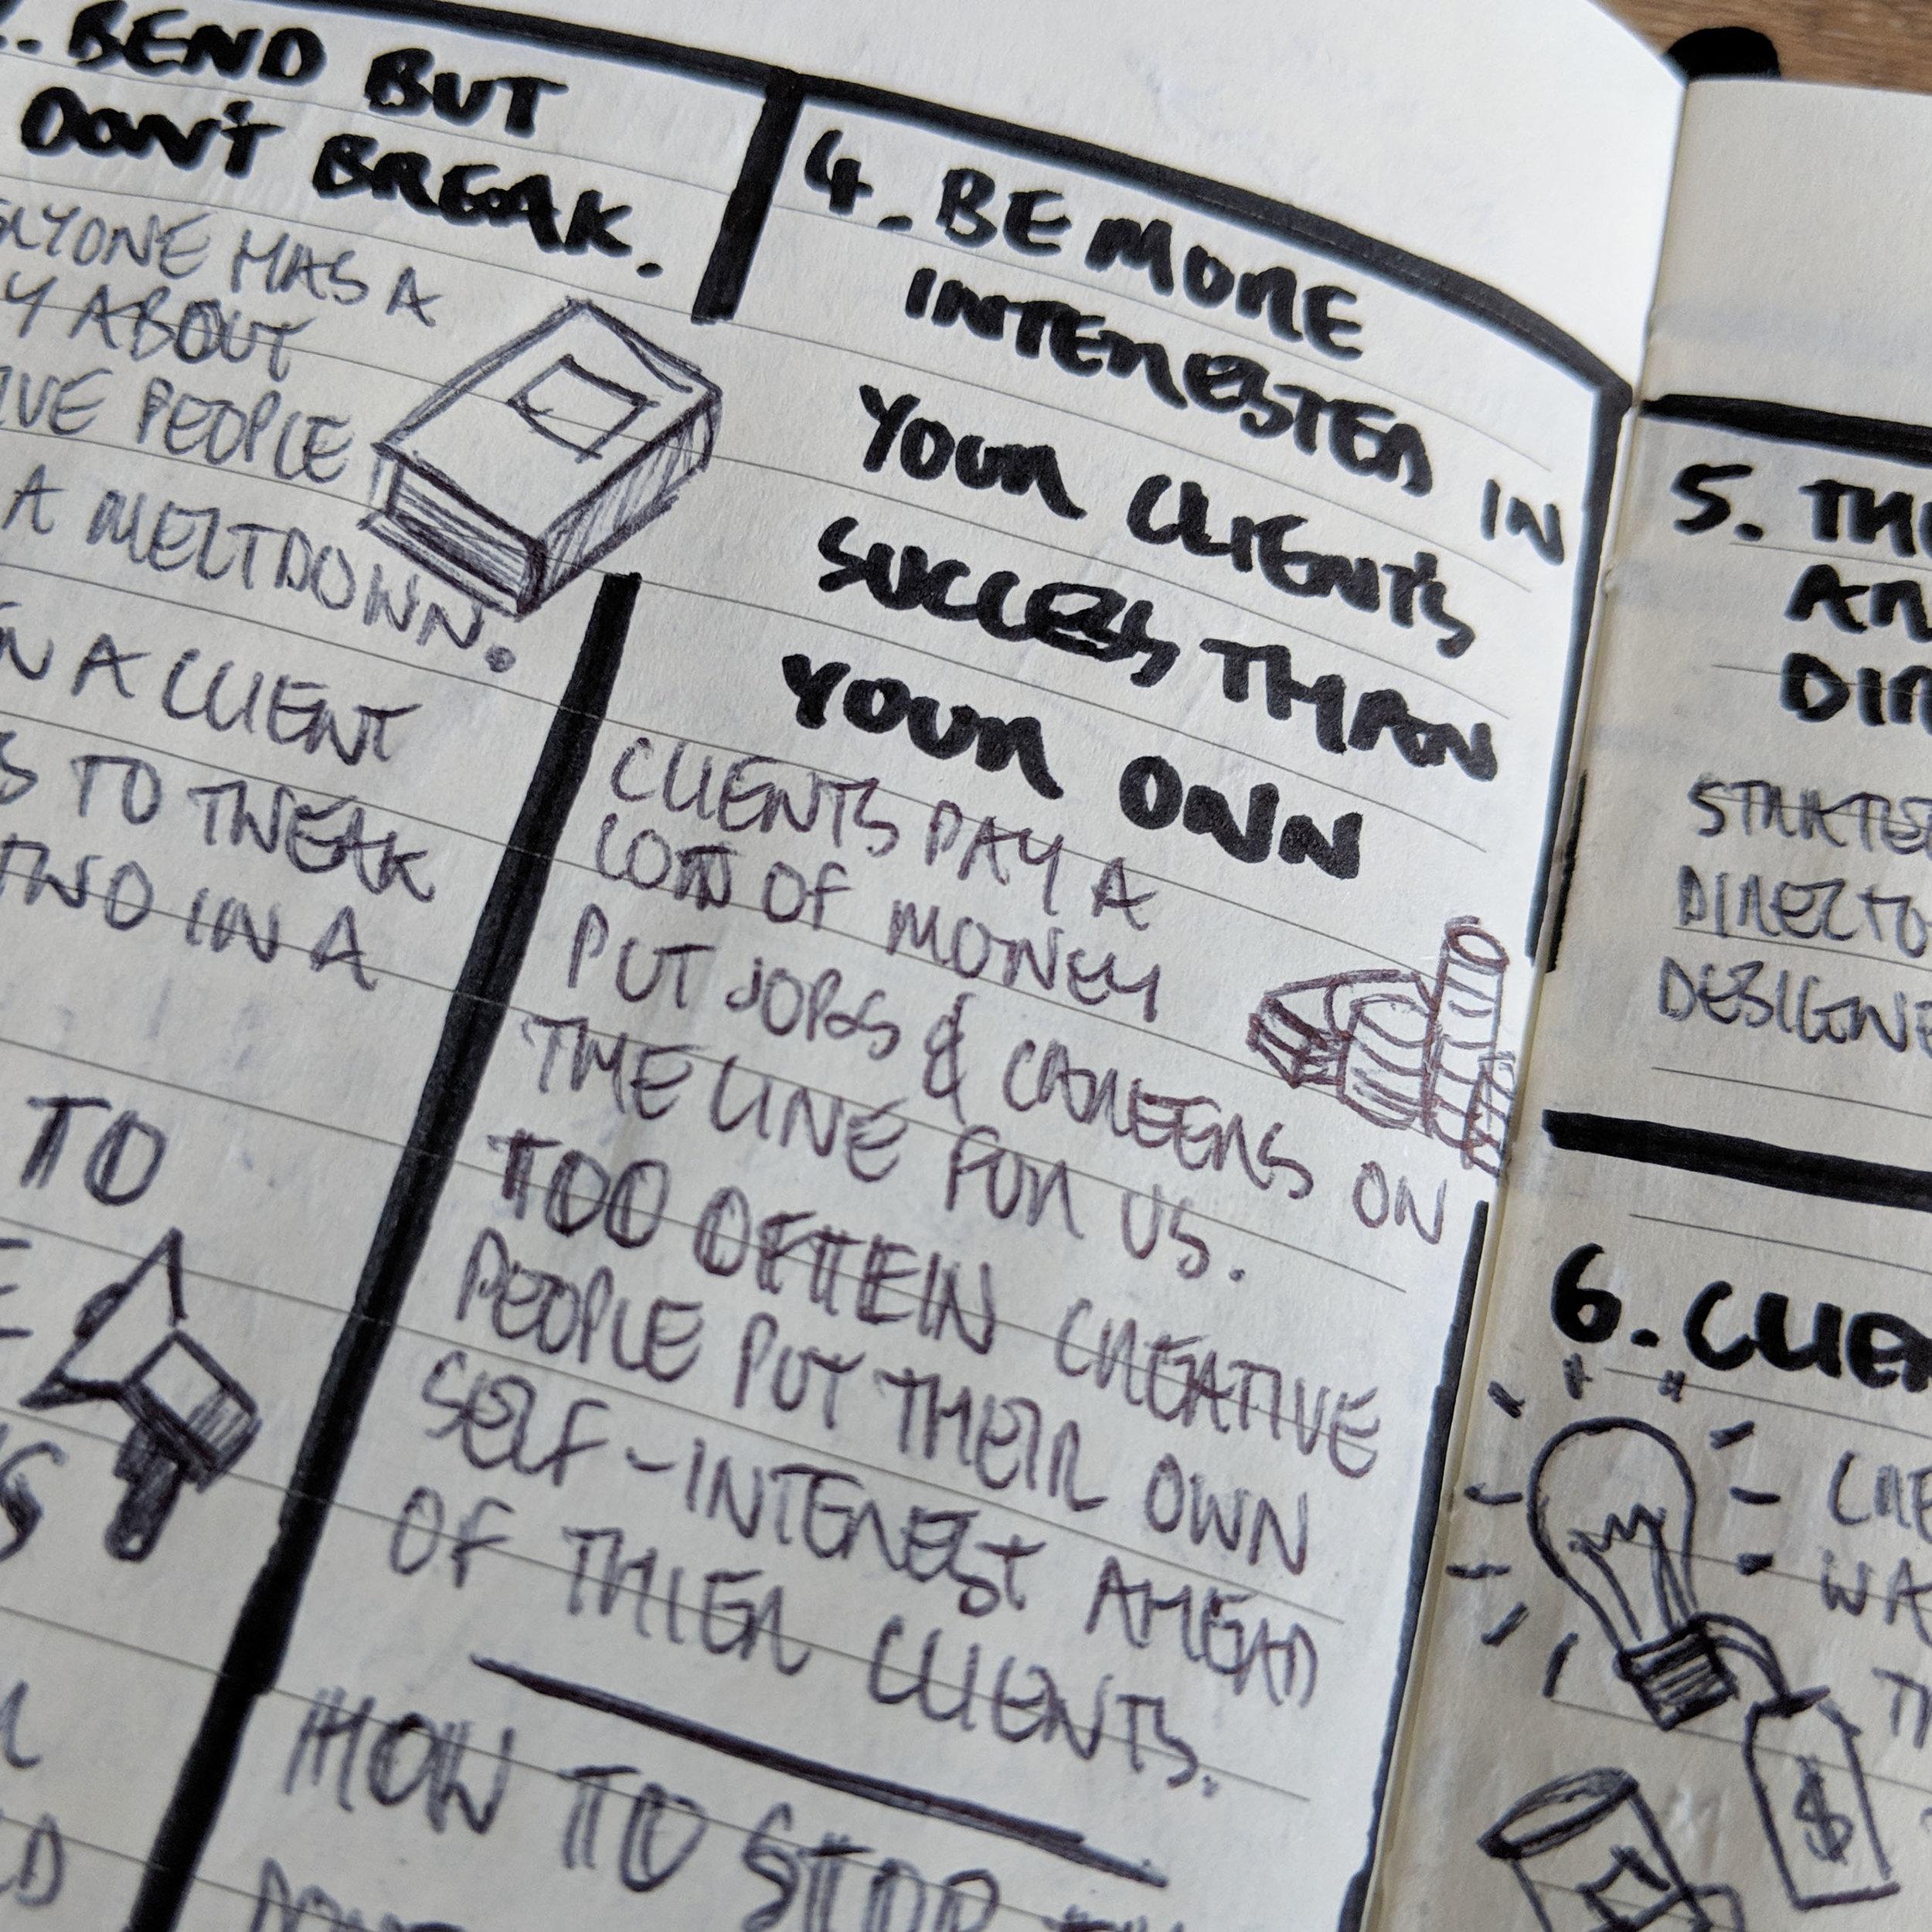 CreativeStrategyAndTheBusinessOfDesign_Part23.7.jpg